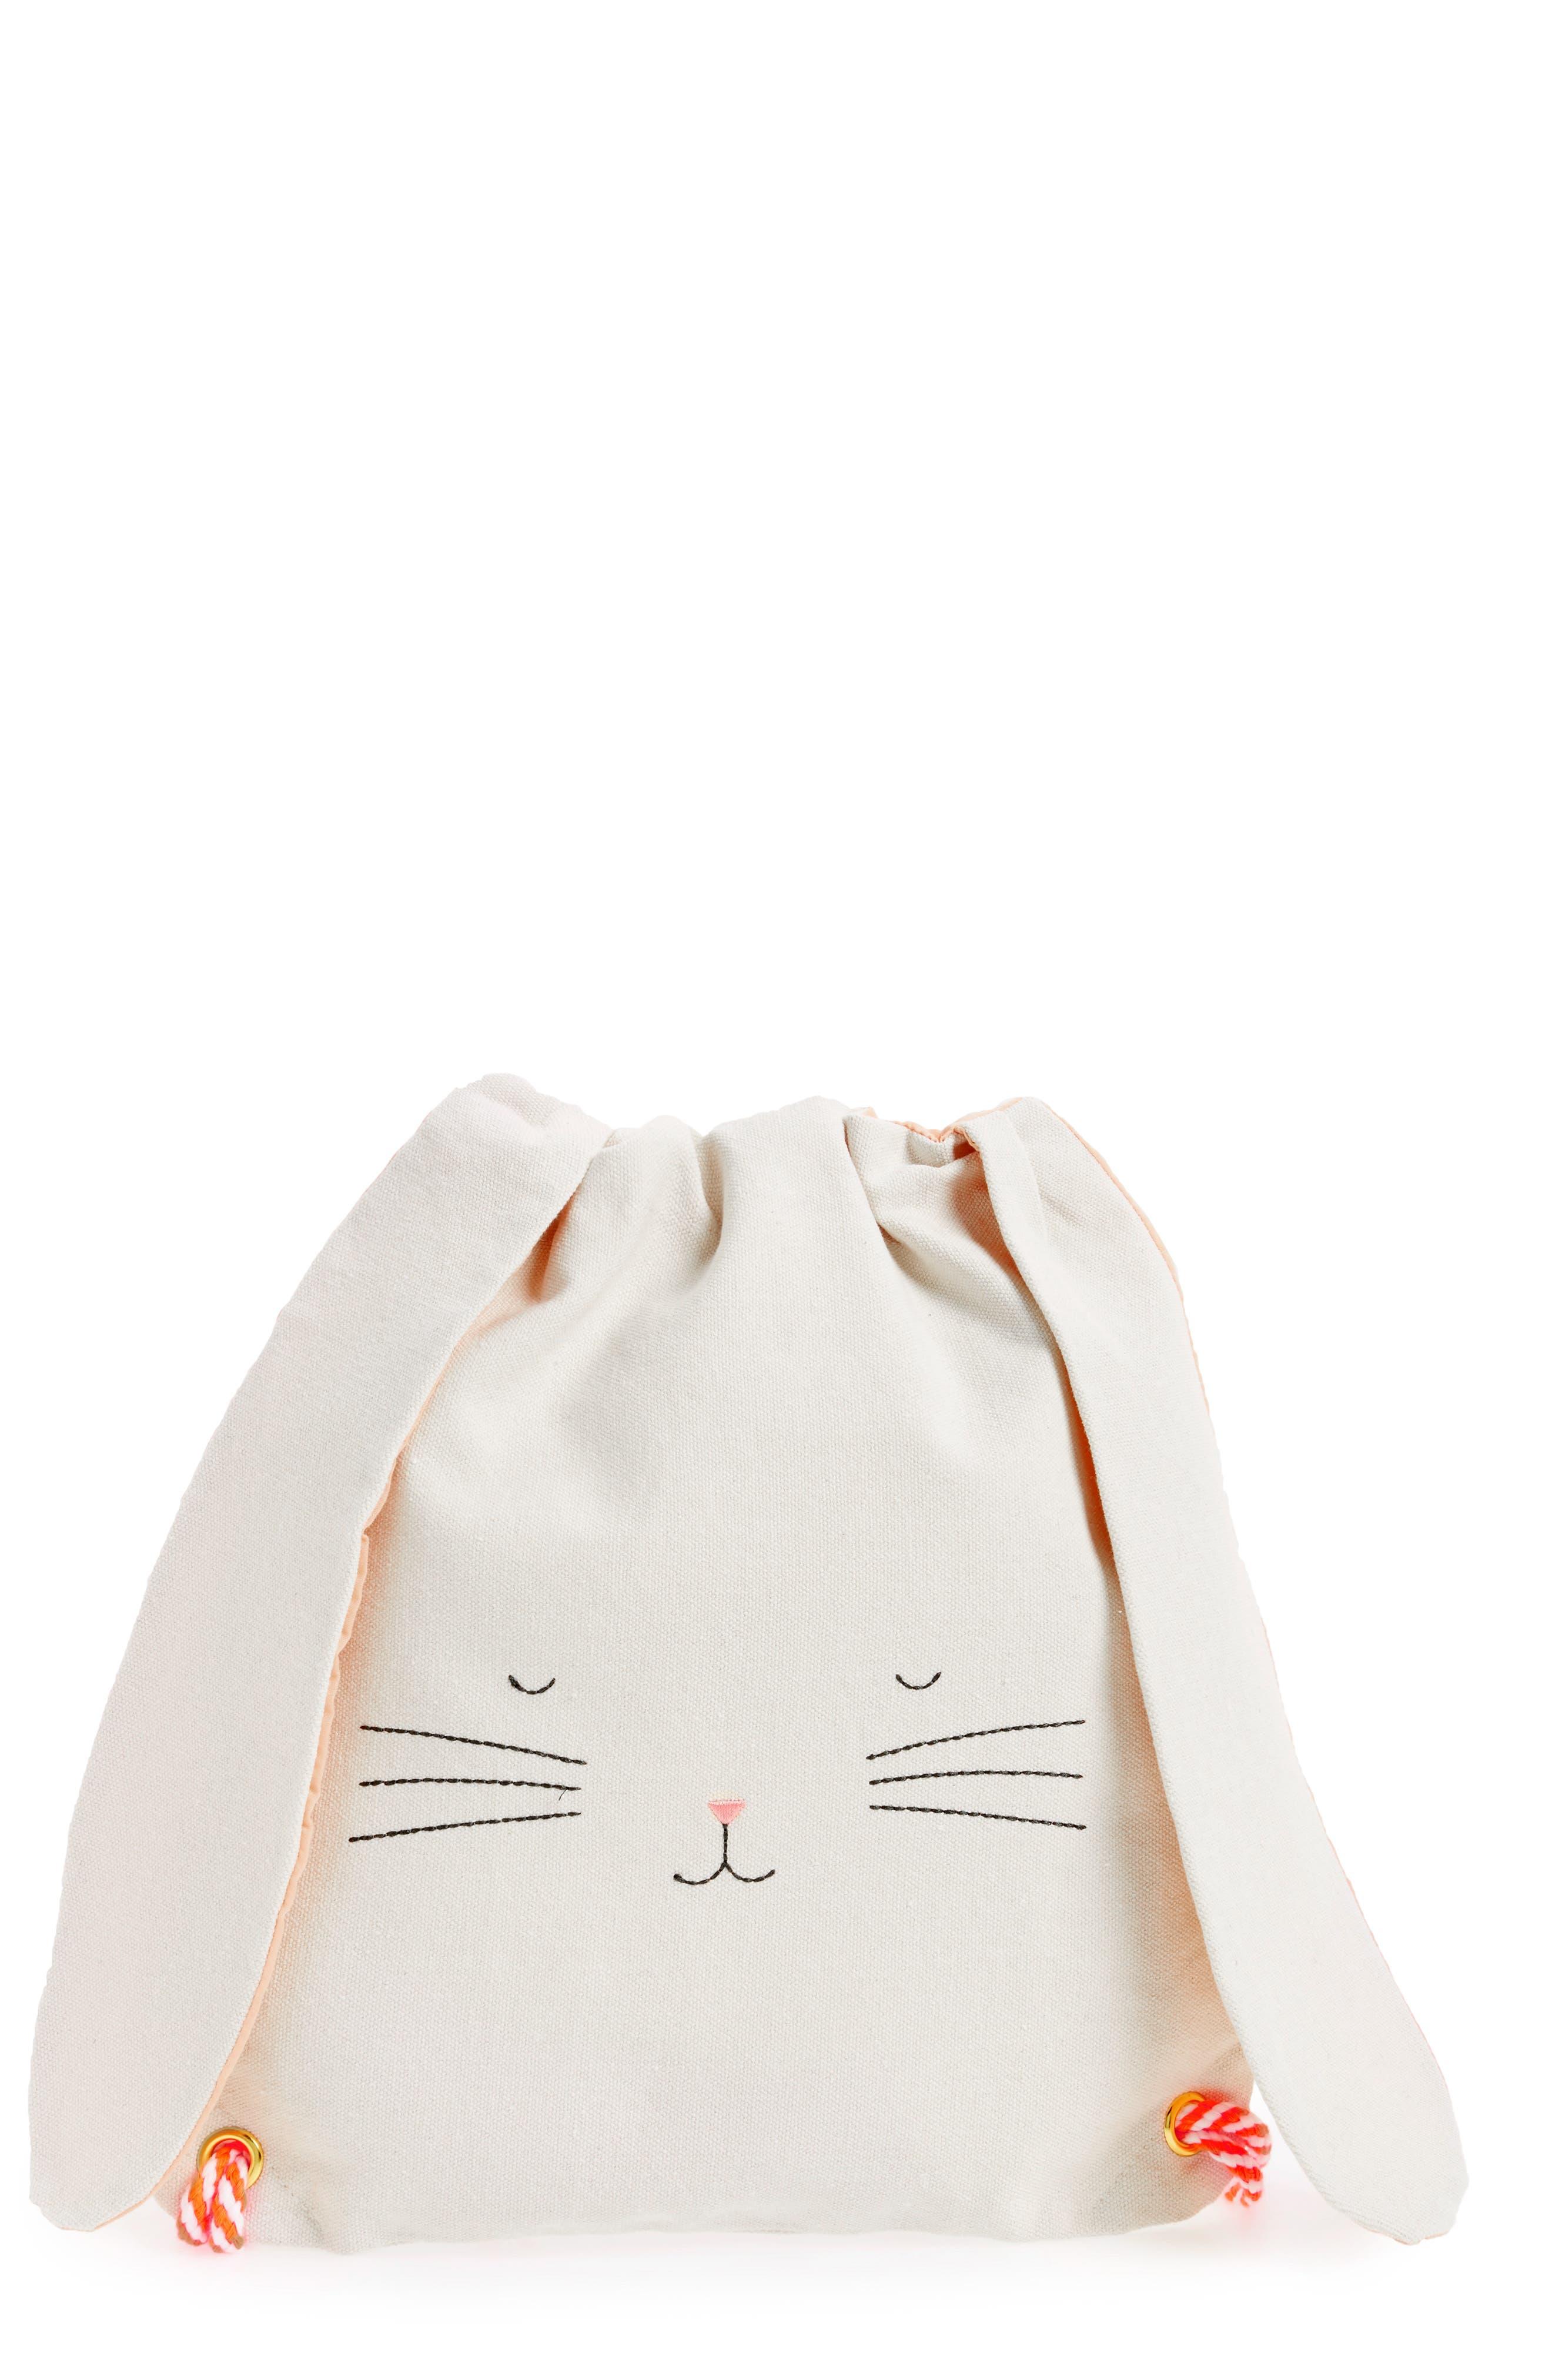 Alternate Image 1 Selected - Meri Meri Bunny Backpack (Kids)